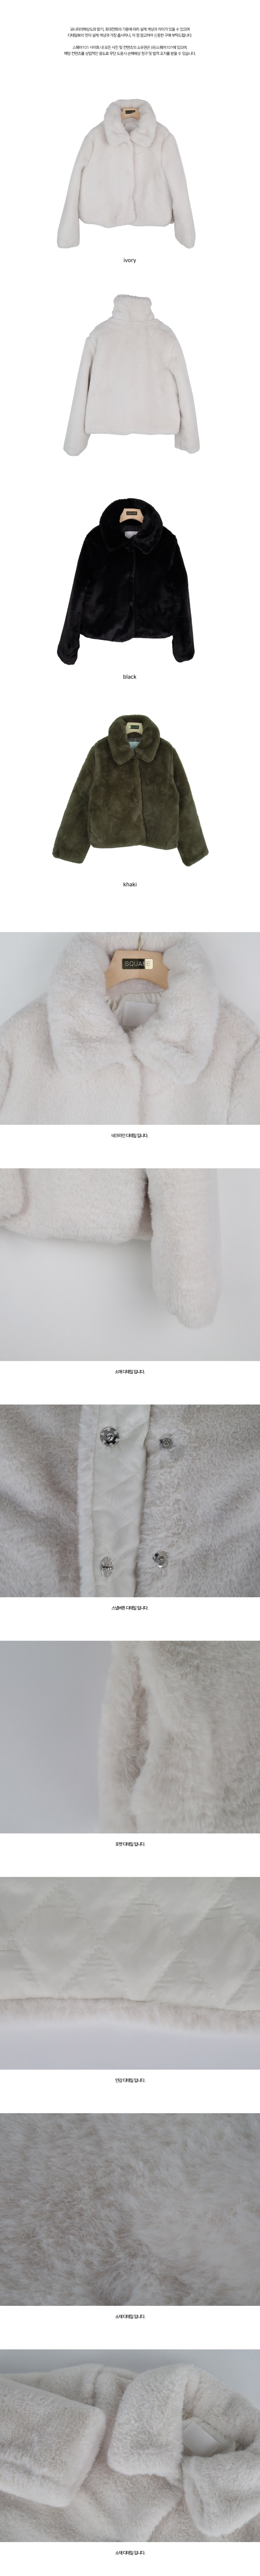 accessories grey color image-S1L4